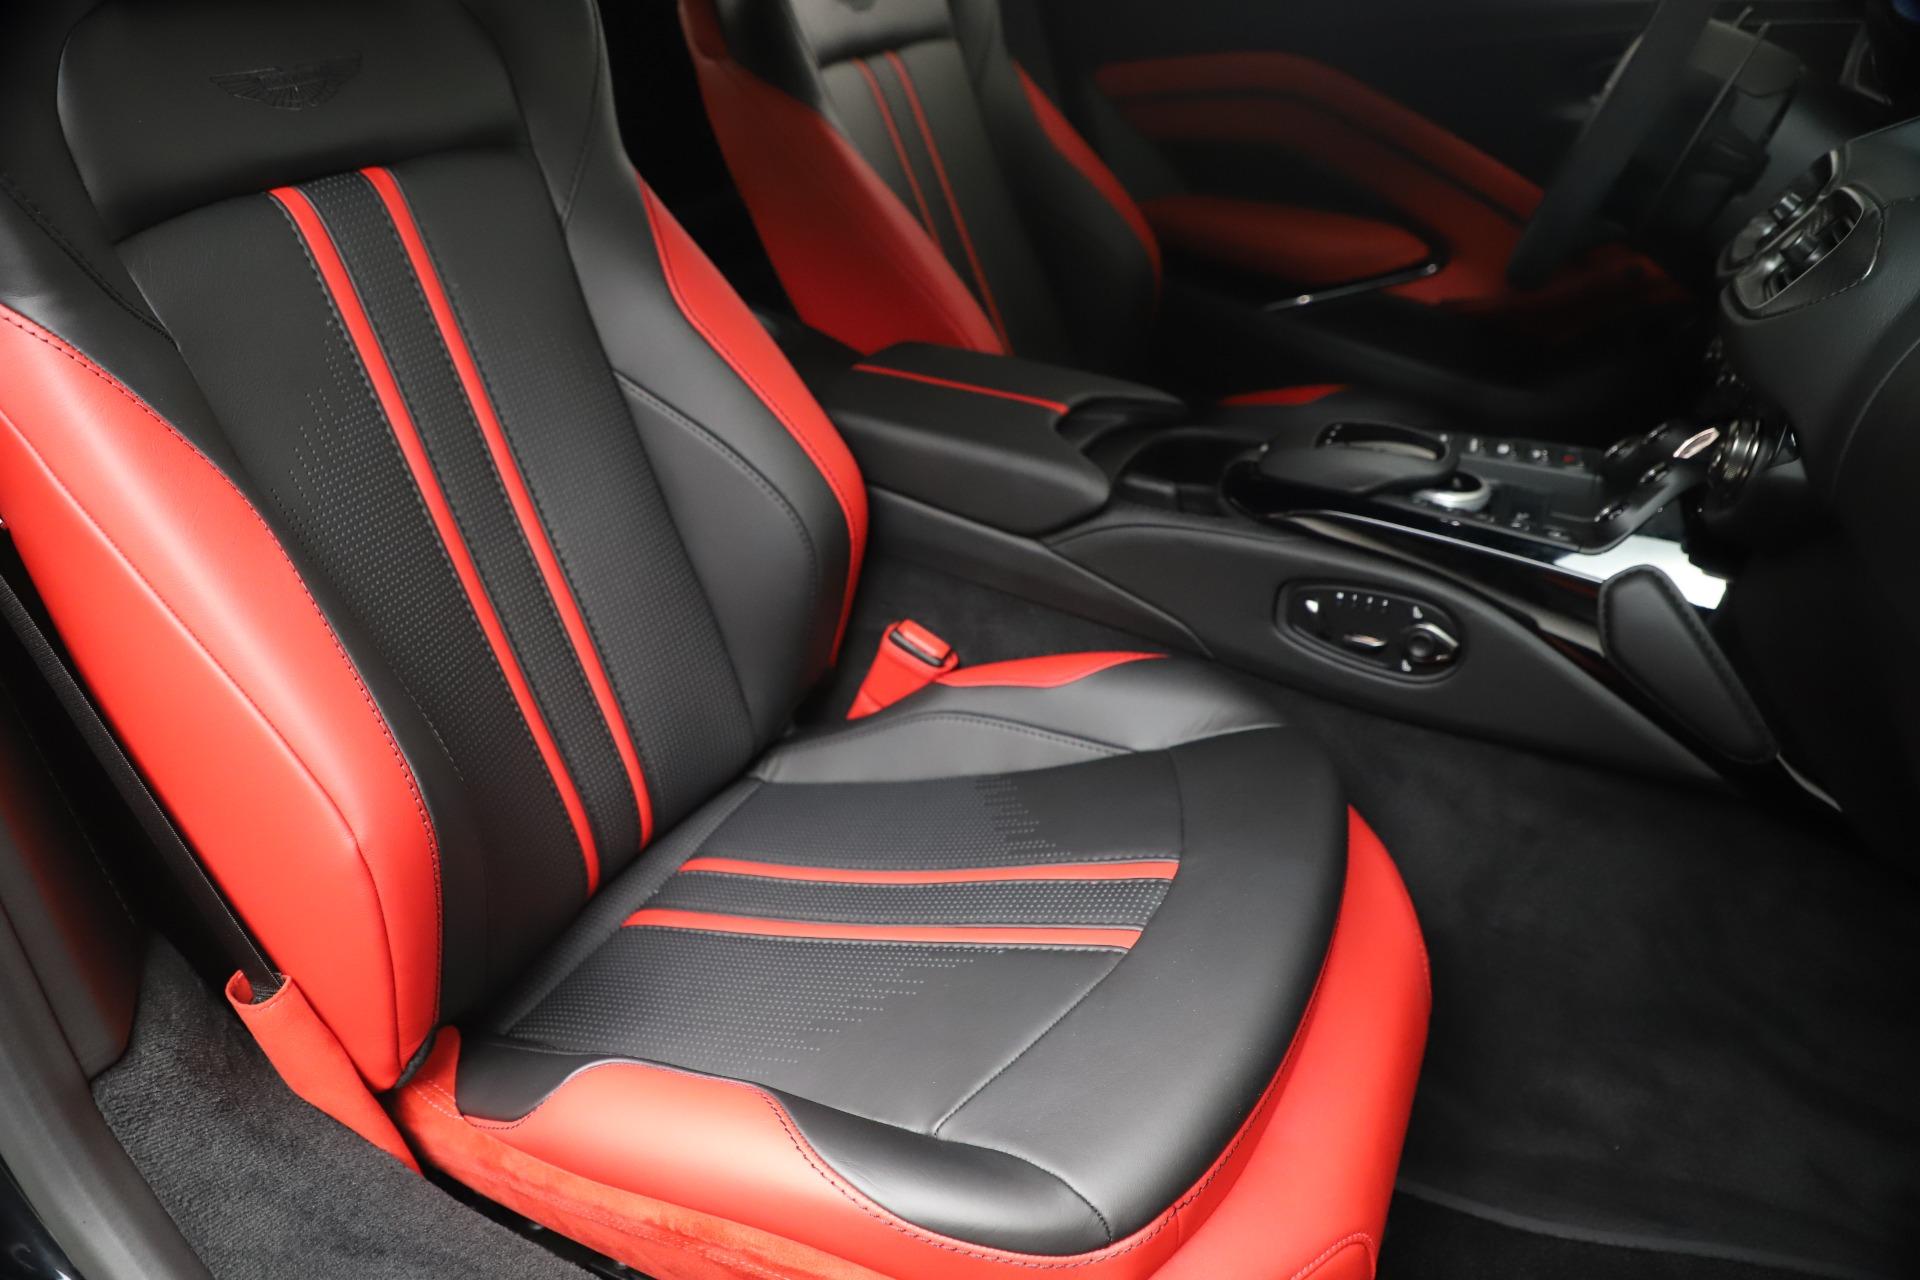 New 2020 Aston Martin Vantage V8 For Sale 190259 In Greenwich, CT